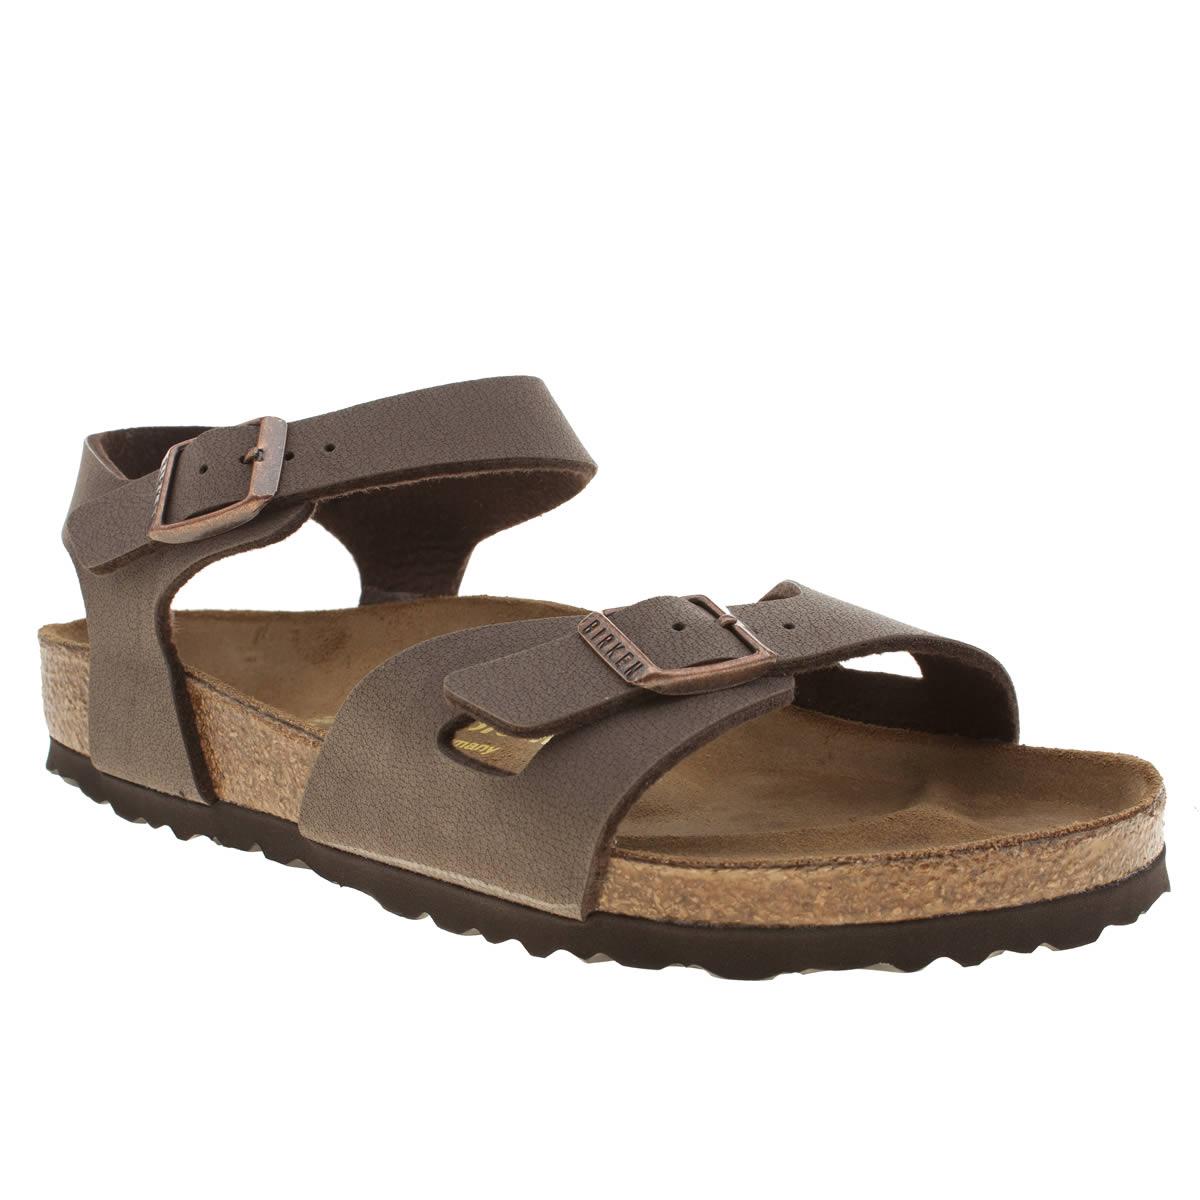 c06b982edf6 Birkenstock Yara Sale Clearance Womens Sandals Size 7.5